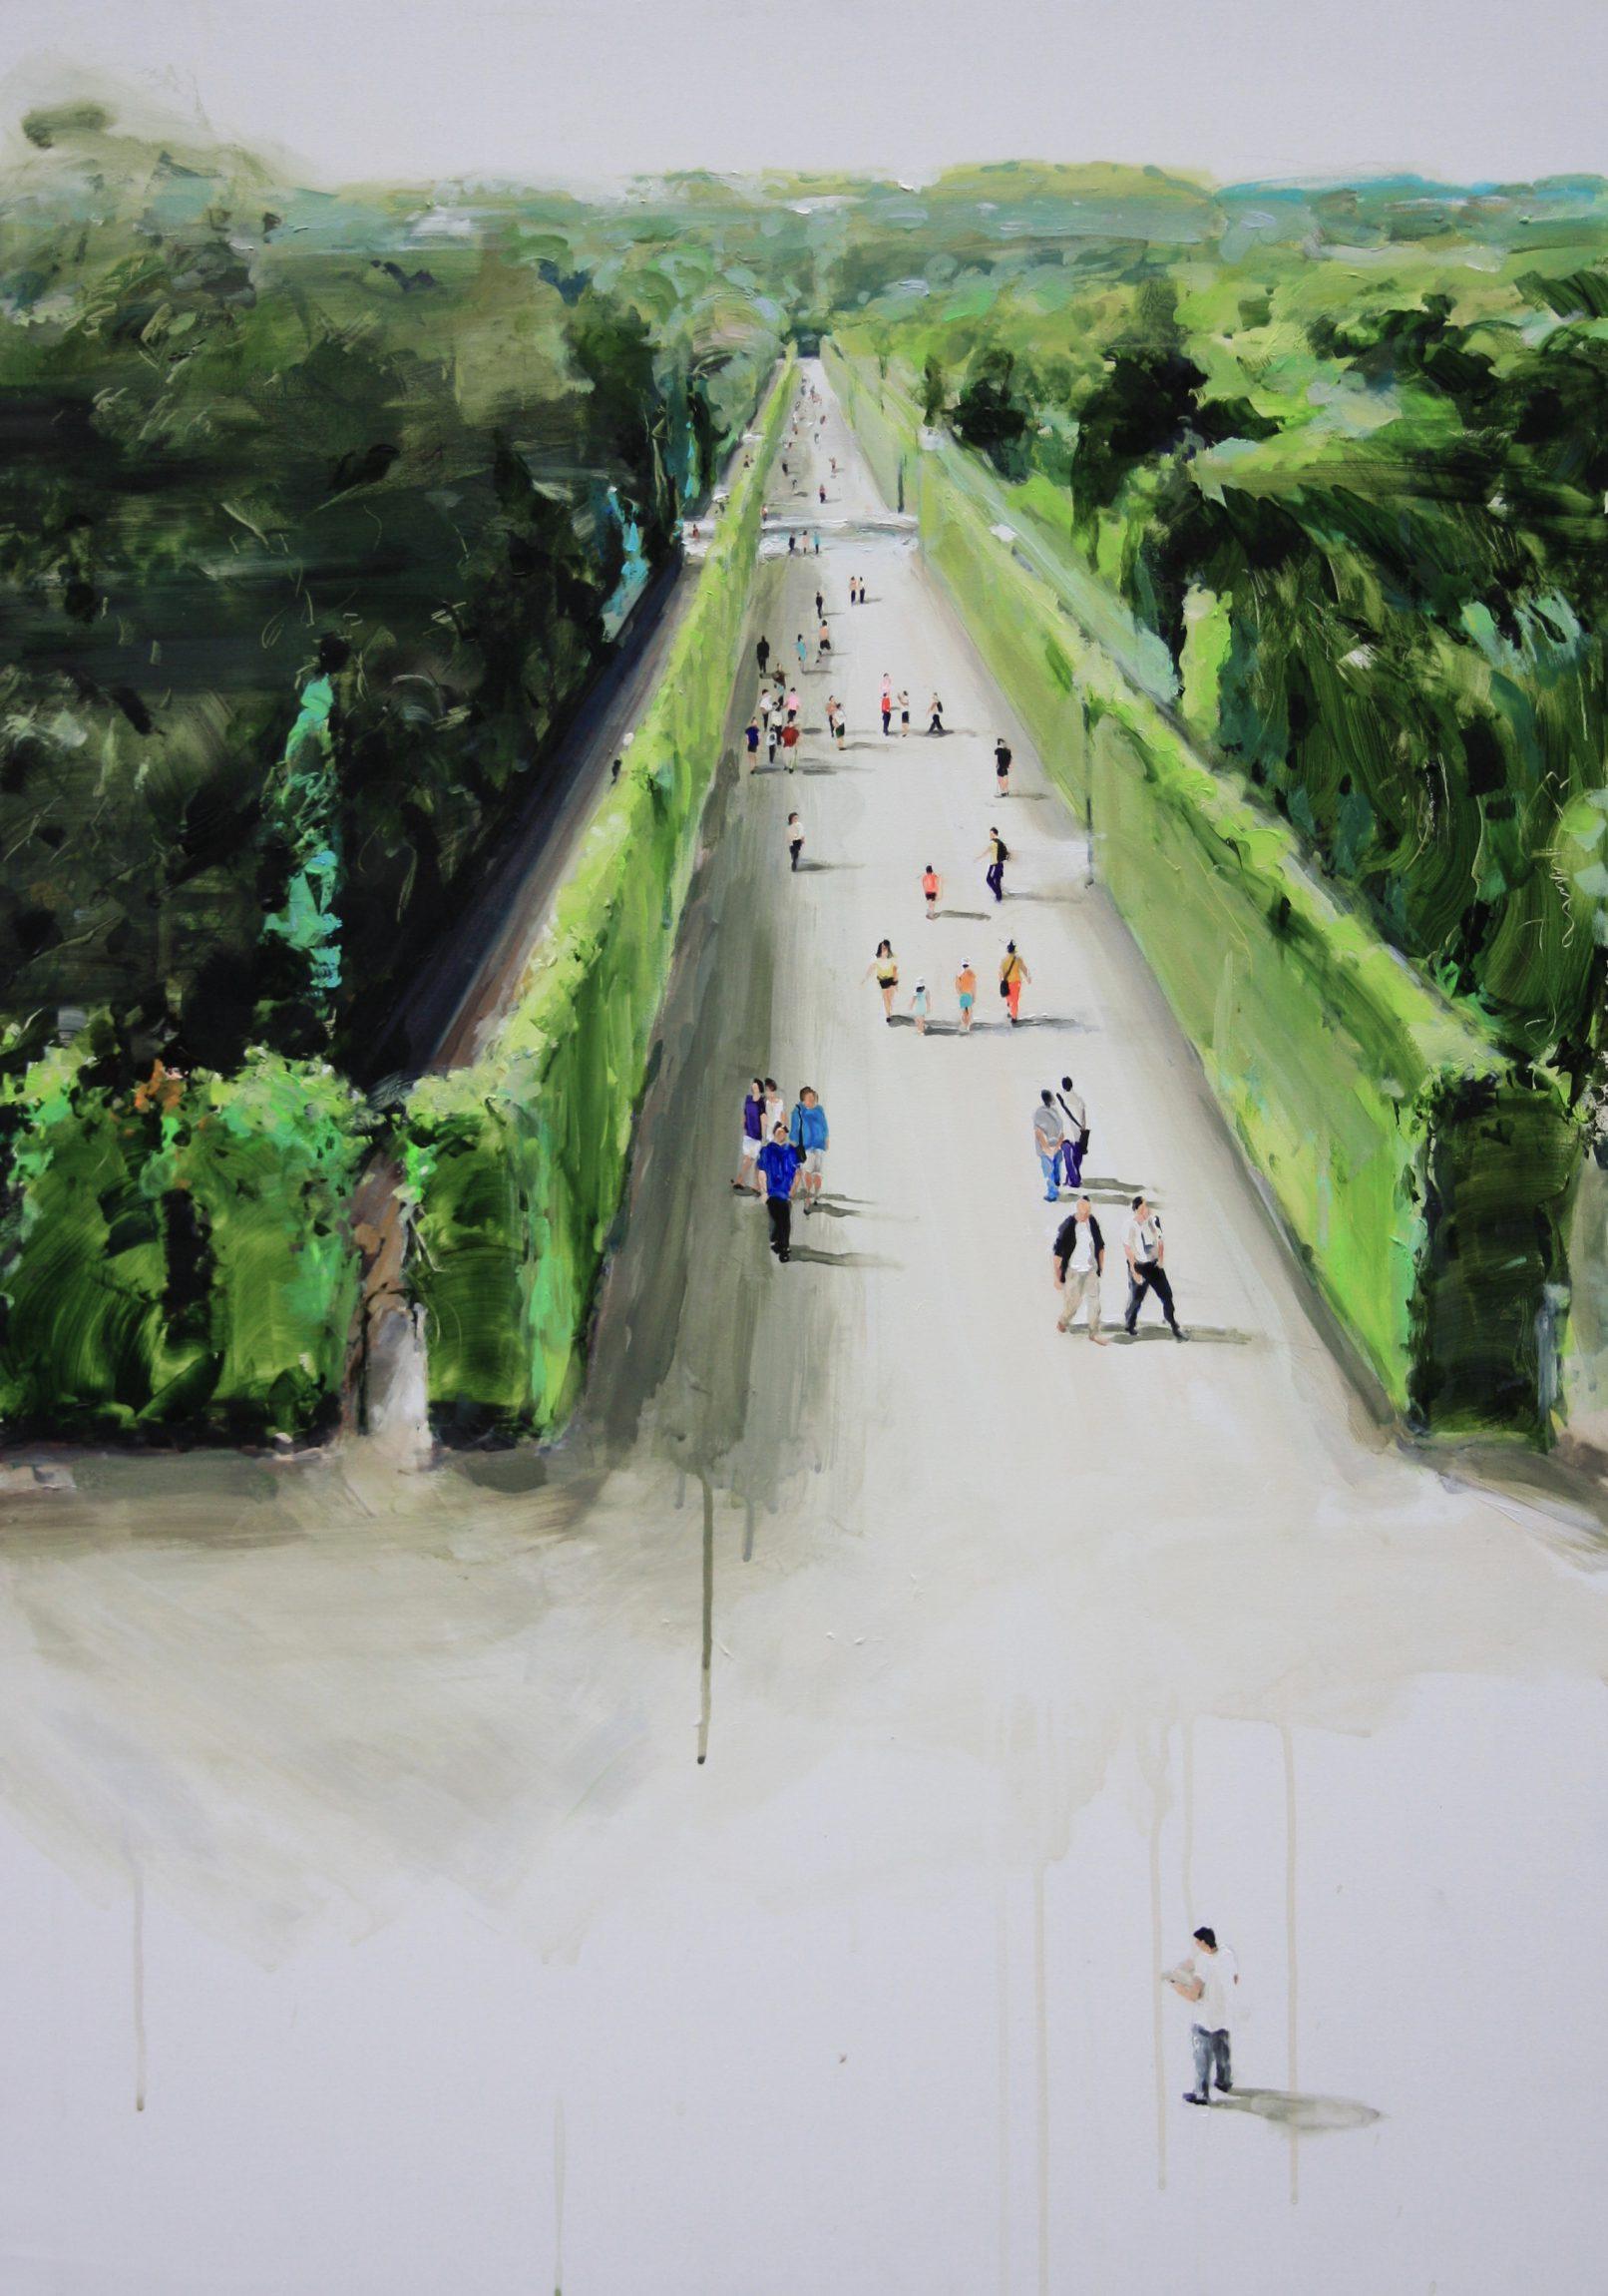 Everyday Scenes Painted by Sanja Milenkovic (9 pics)